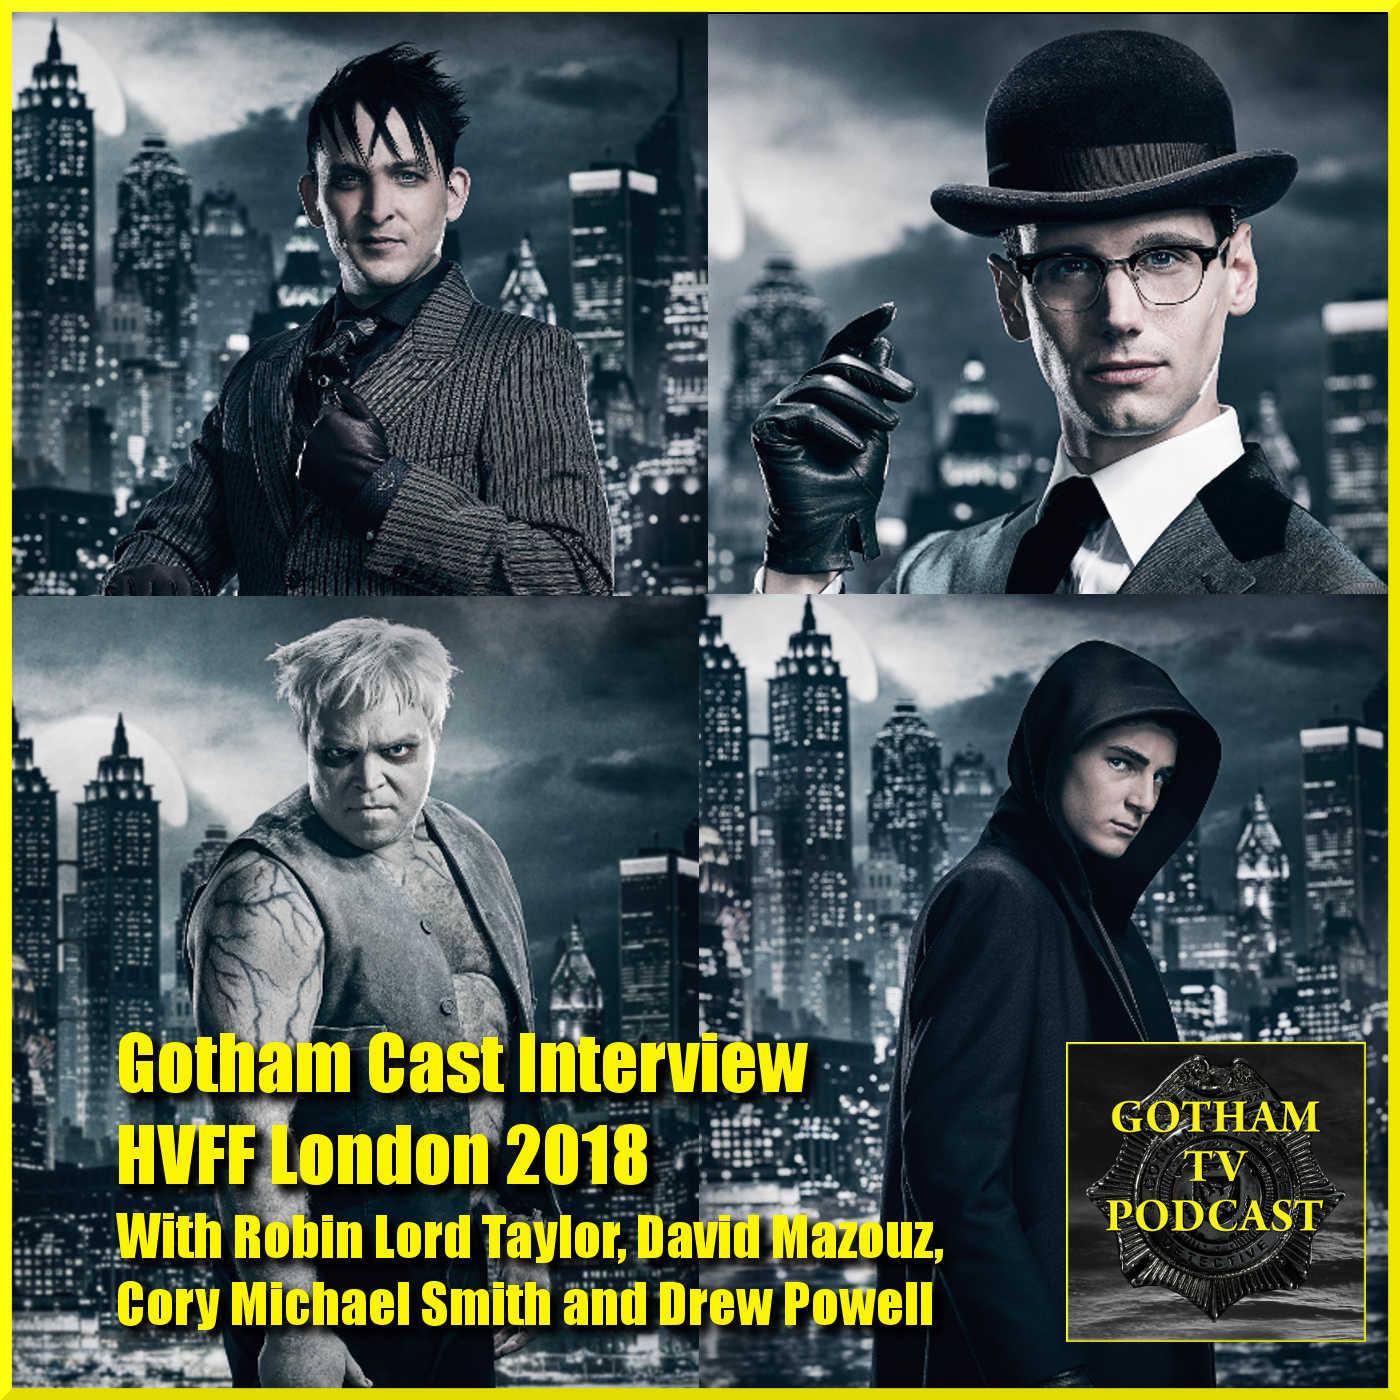 Interviews Archives - Gotham TV Podcast